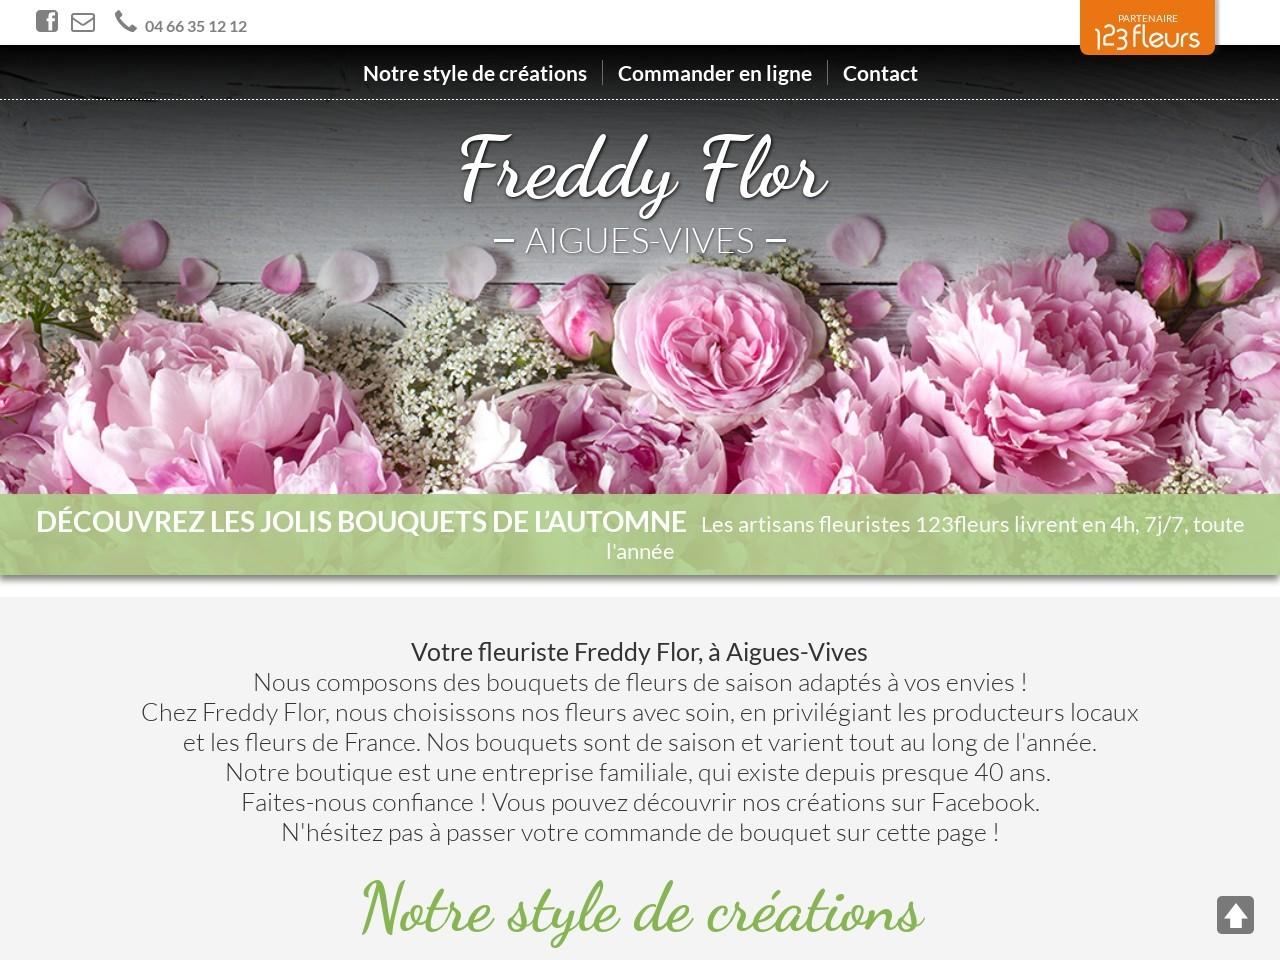 Site fleuriste Freddy Flor - 123fleurs